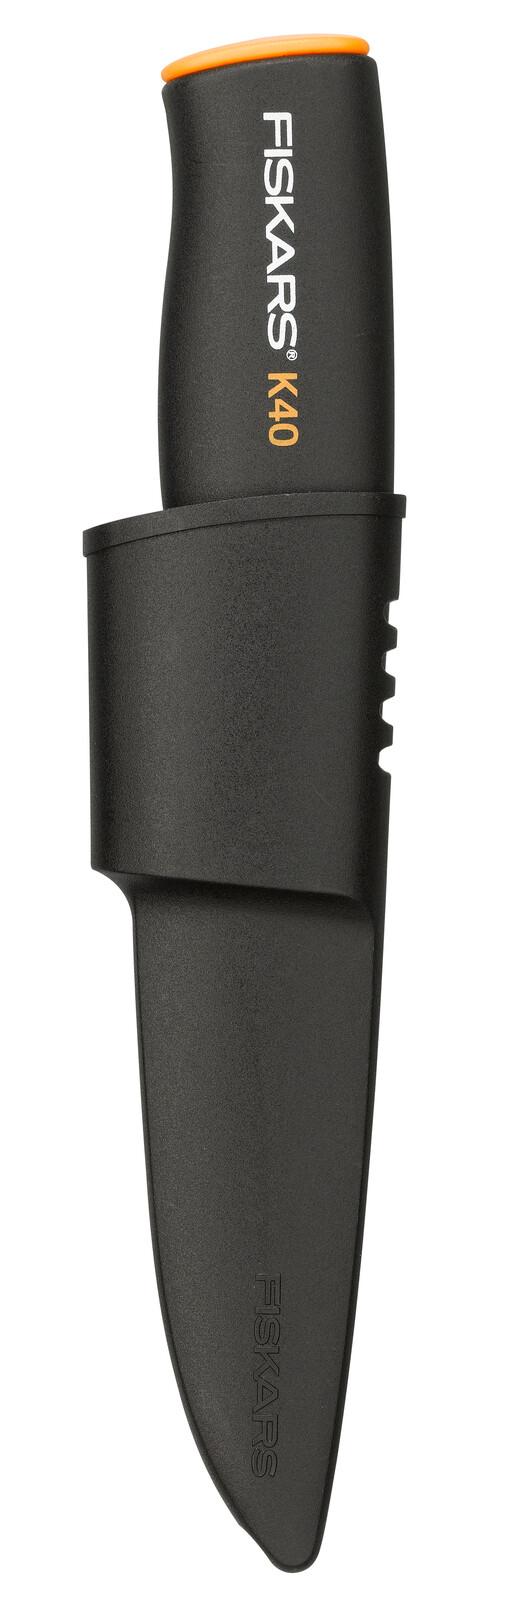 Fiskars Нож общего назначения с чехлом K40,  22,5 см, 70г